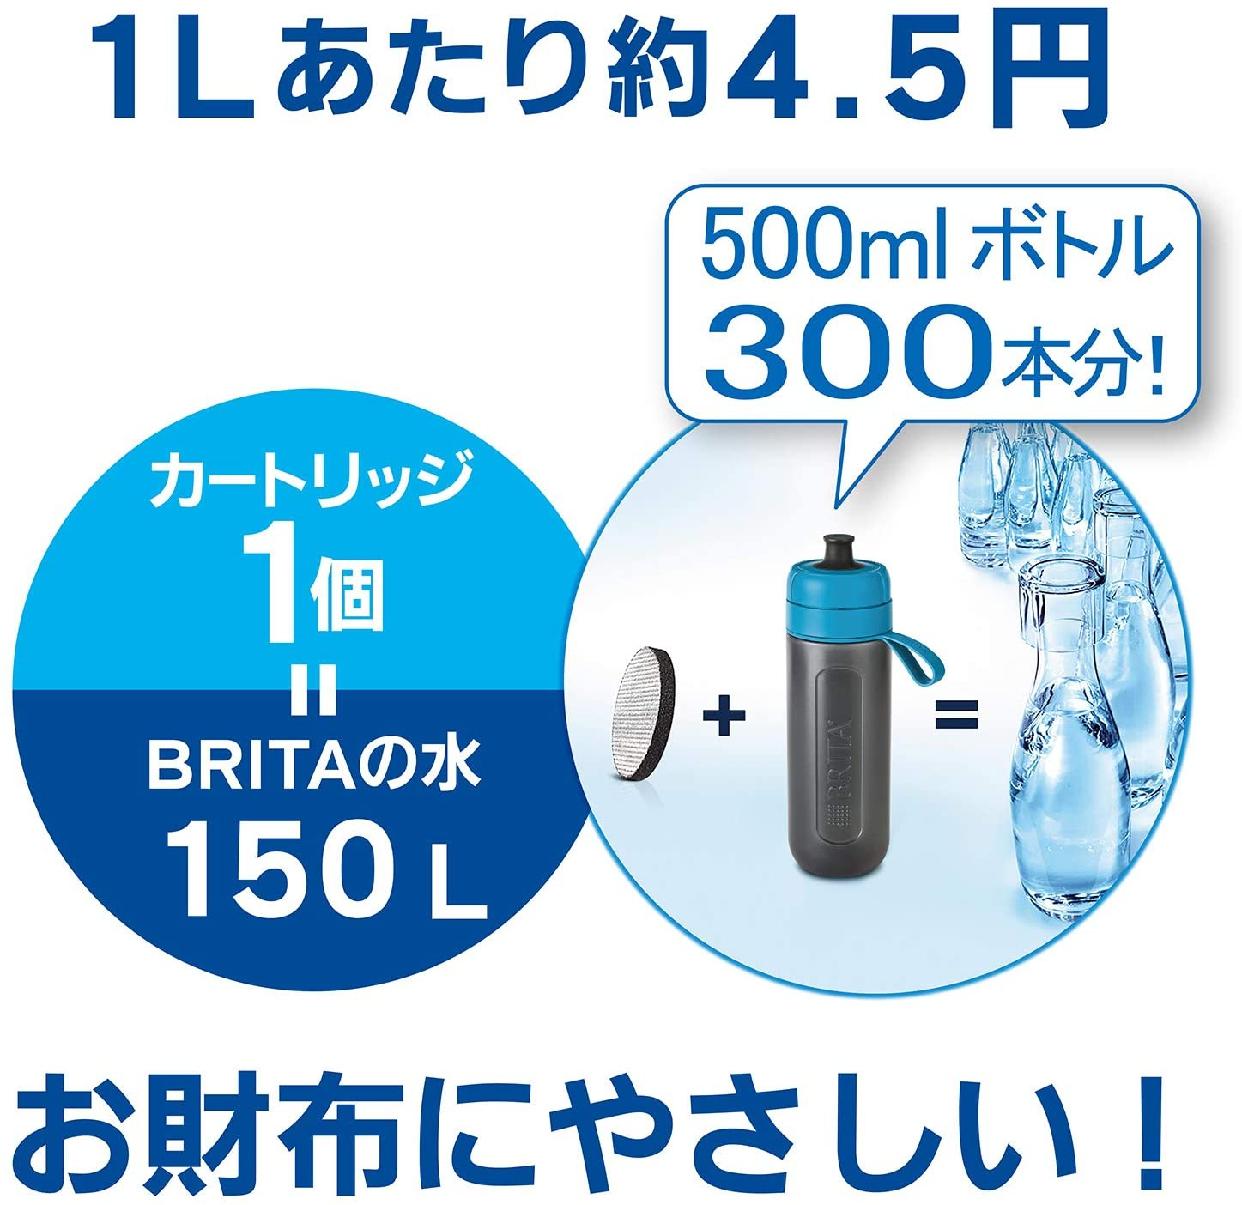 BRITA(ブリタ) fill&go Activeの商品画像4